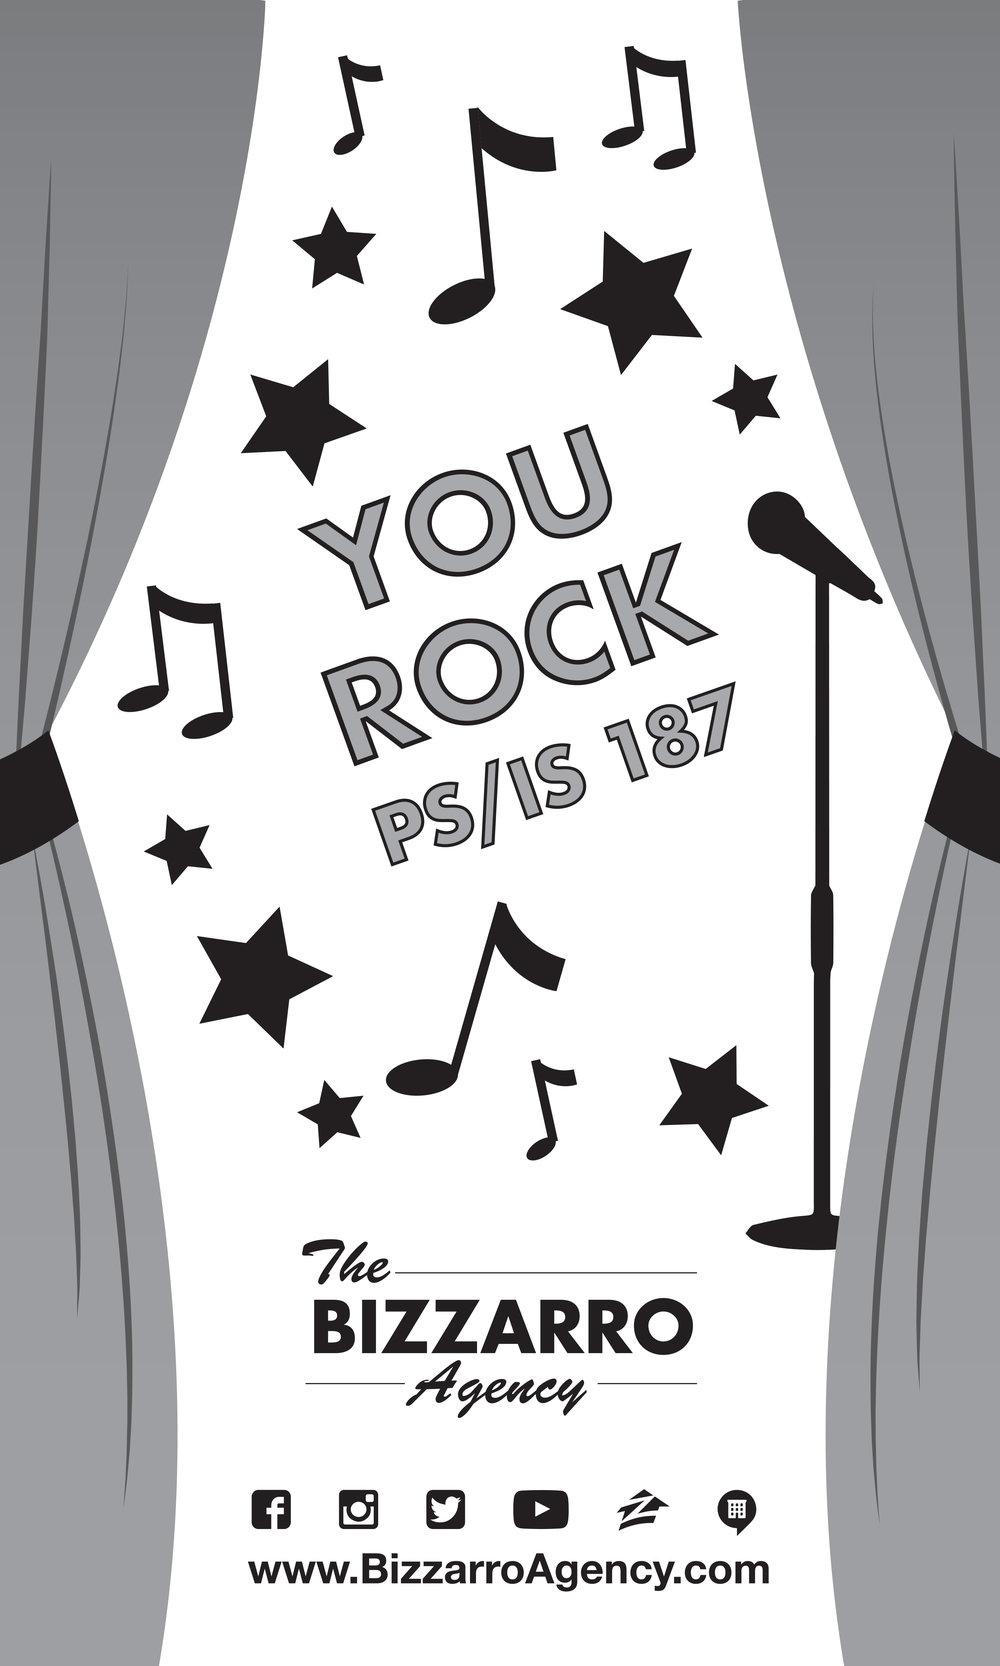 The Bizzarro Agency